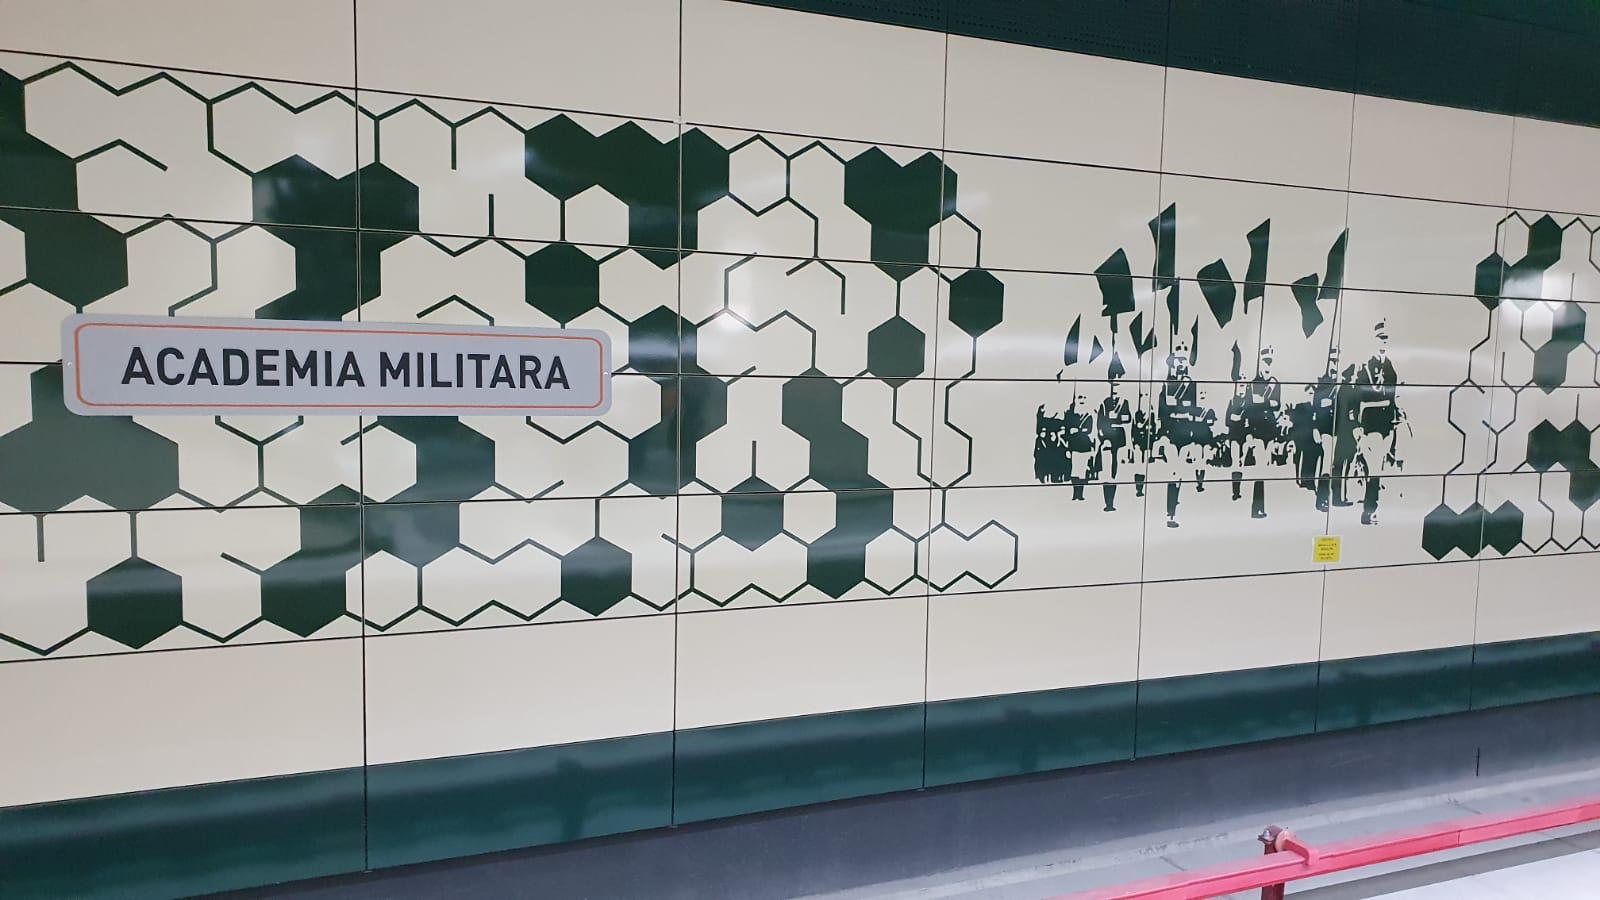 Academia Militară